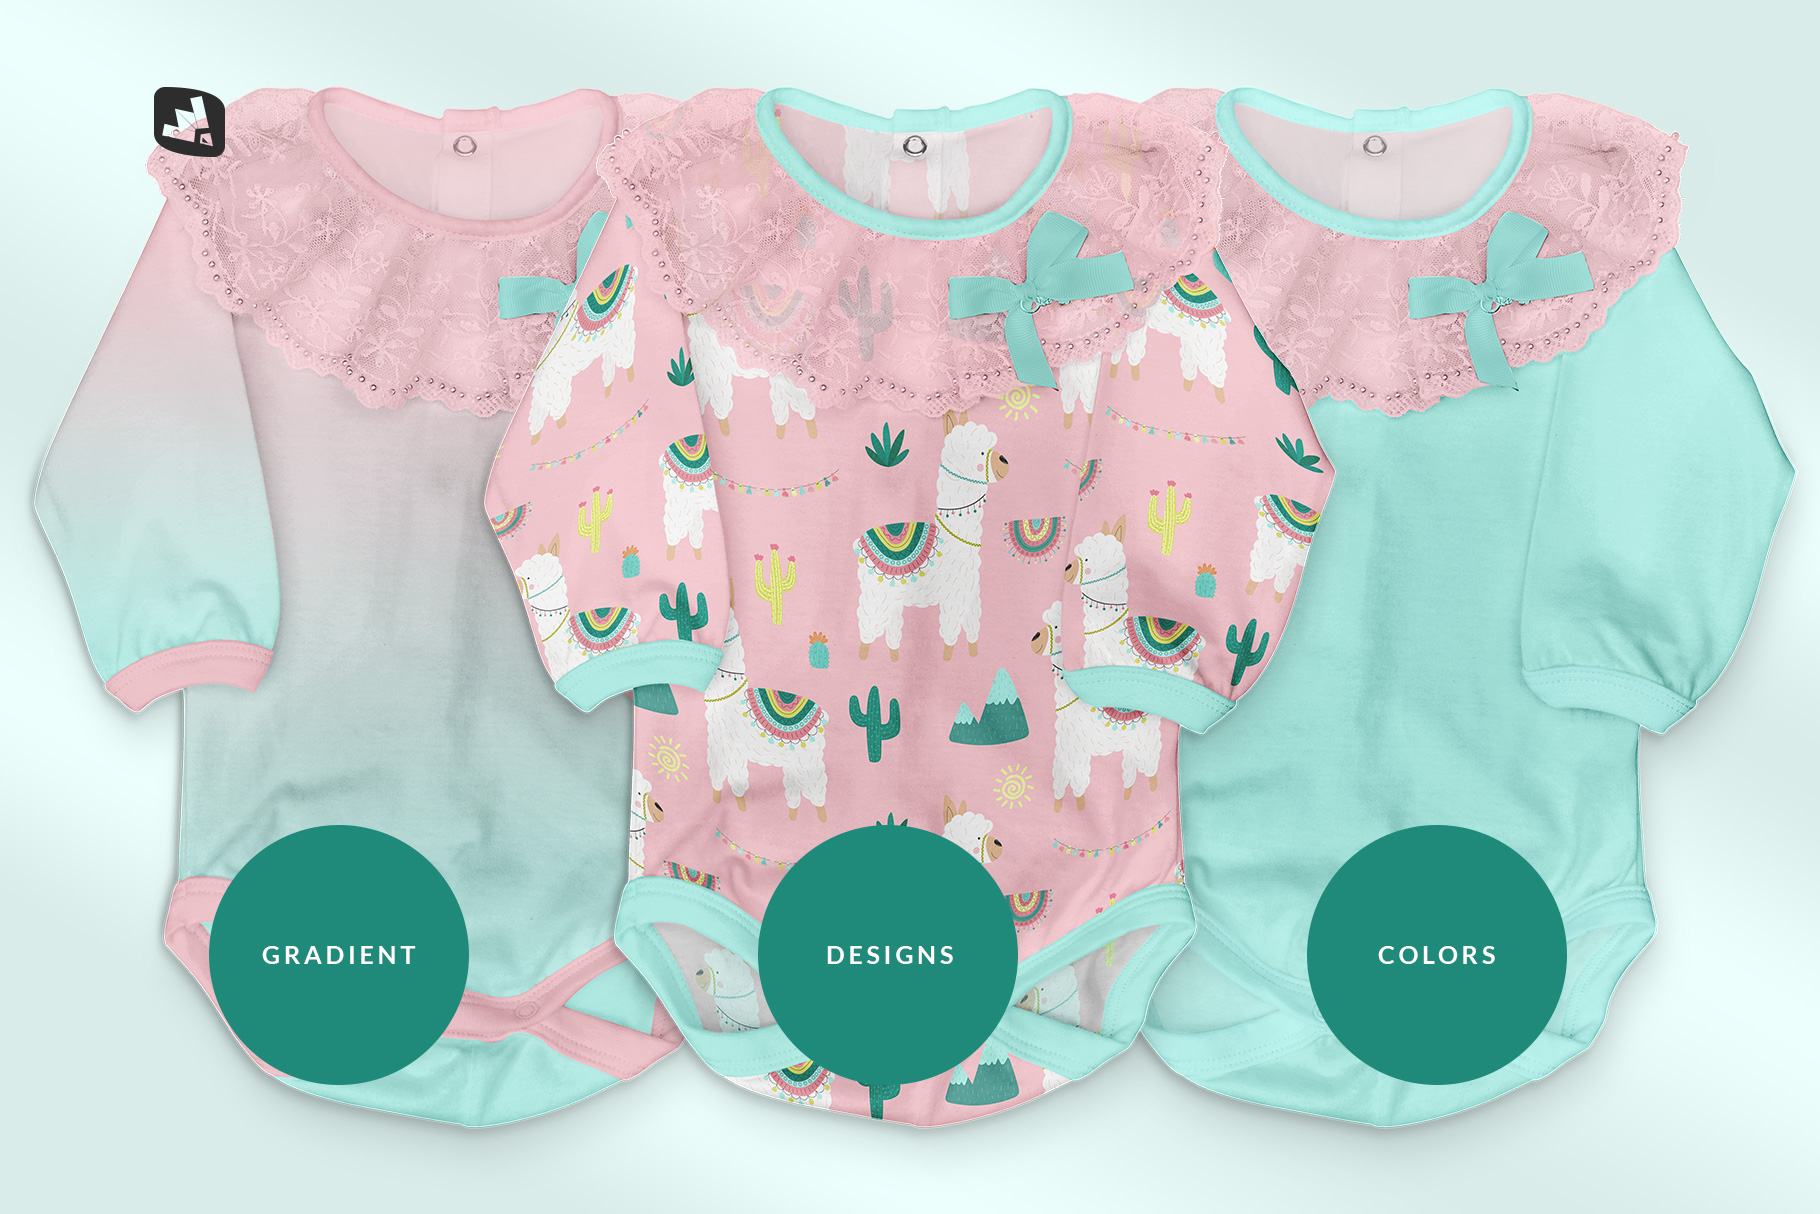 types of the baby girl's onesie mockup